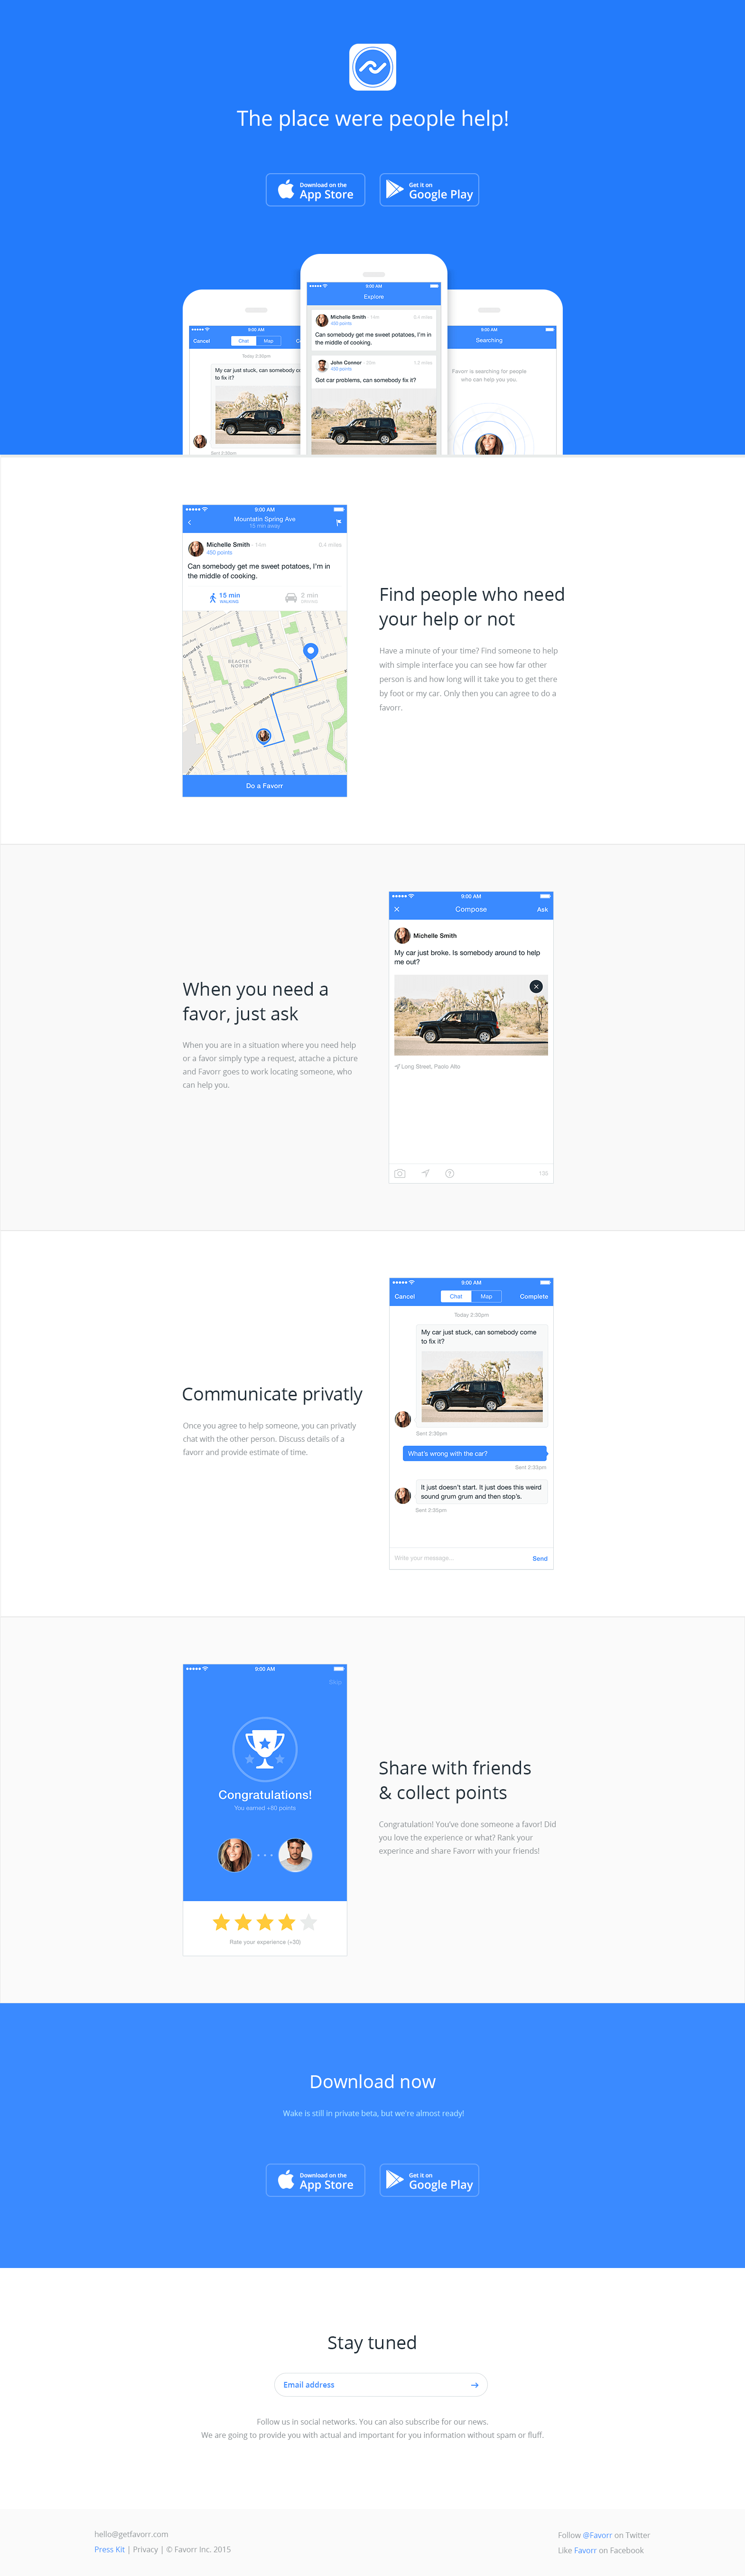 Favorr landing page